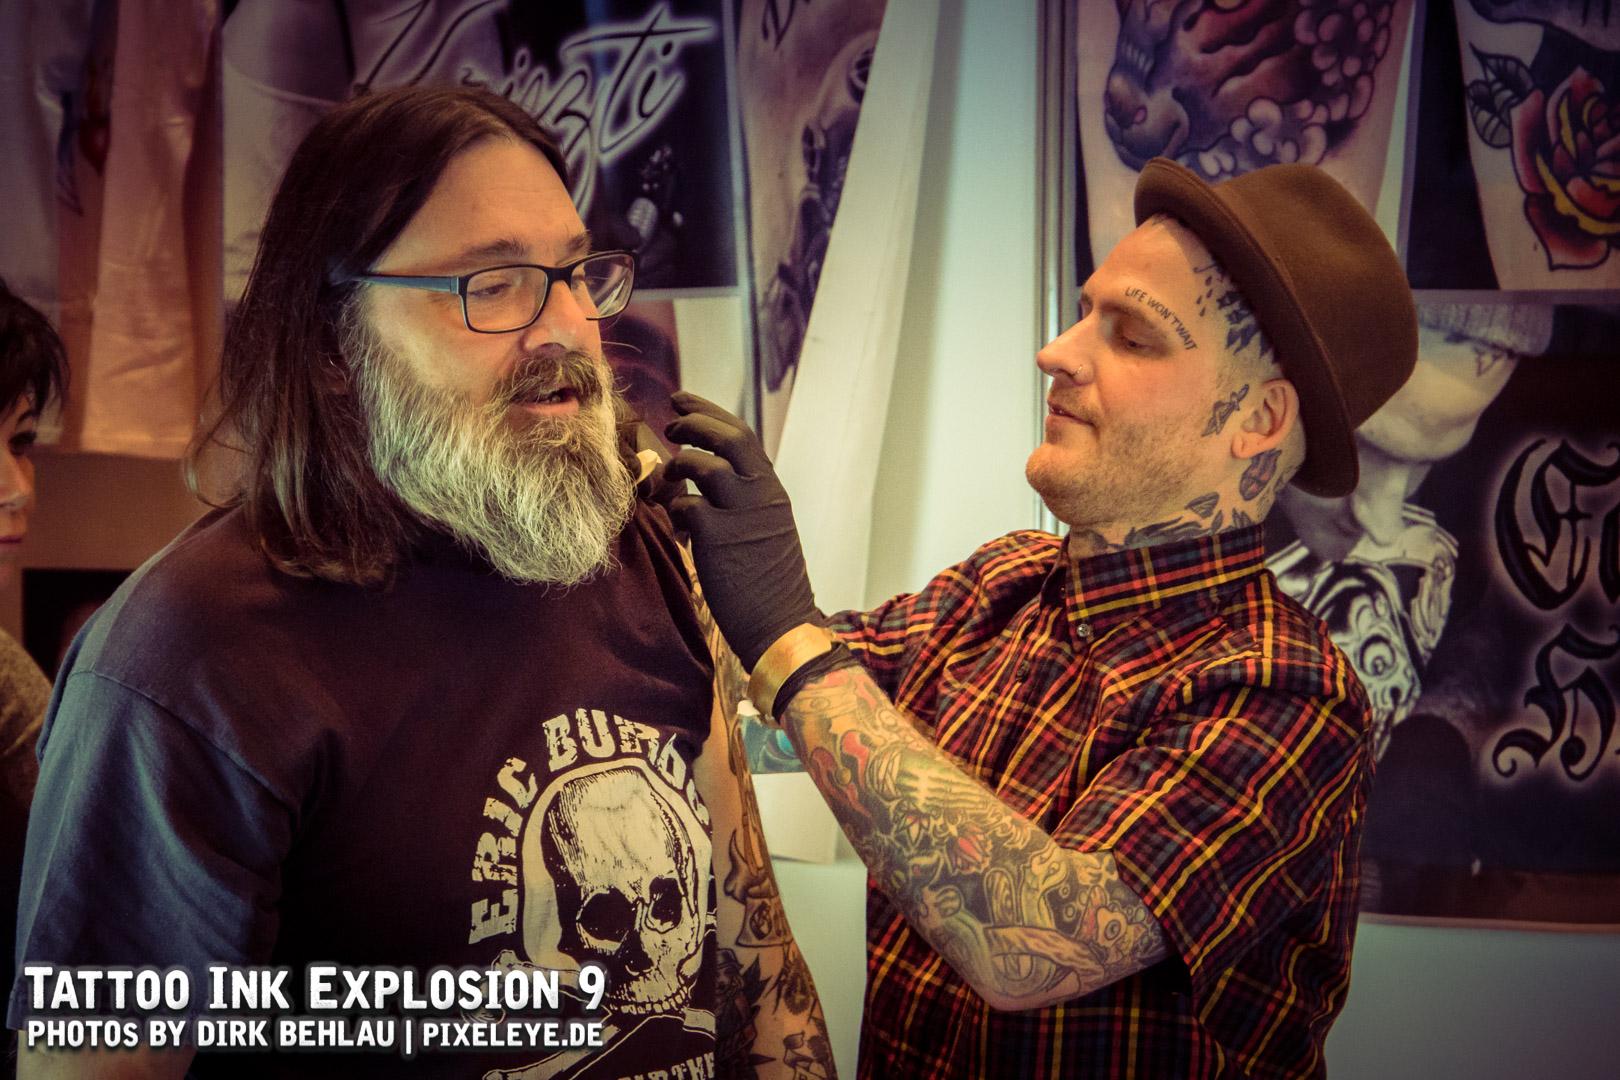 Tattoo Ink Explosion 2018 WEB by Dirk Behlau-0253.jpg